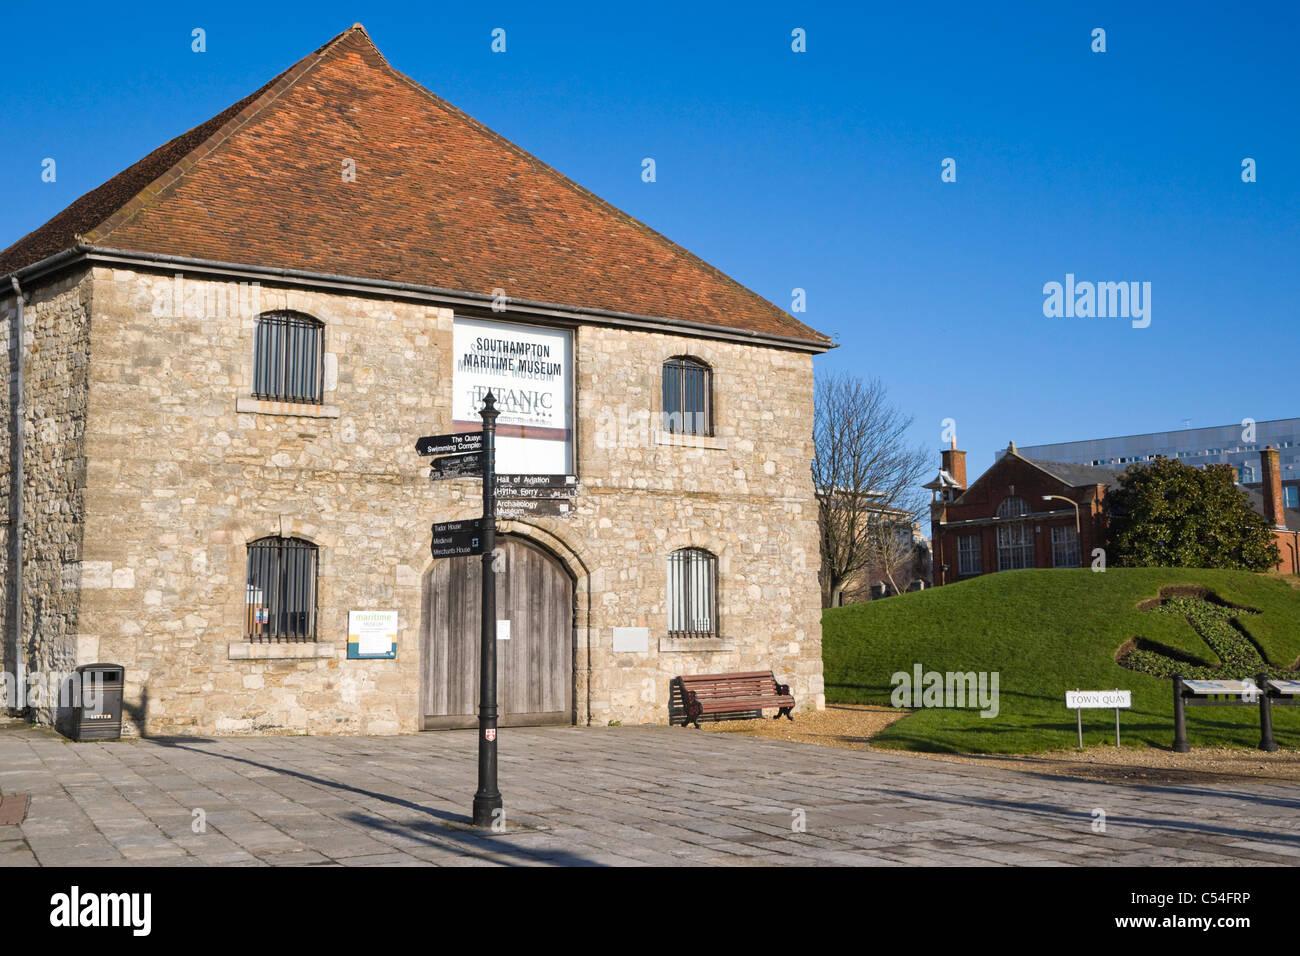 The former medieval Wool House, Southampton Maritime Museum, Southampton, Hampshire, England, UK - Stock Image